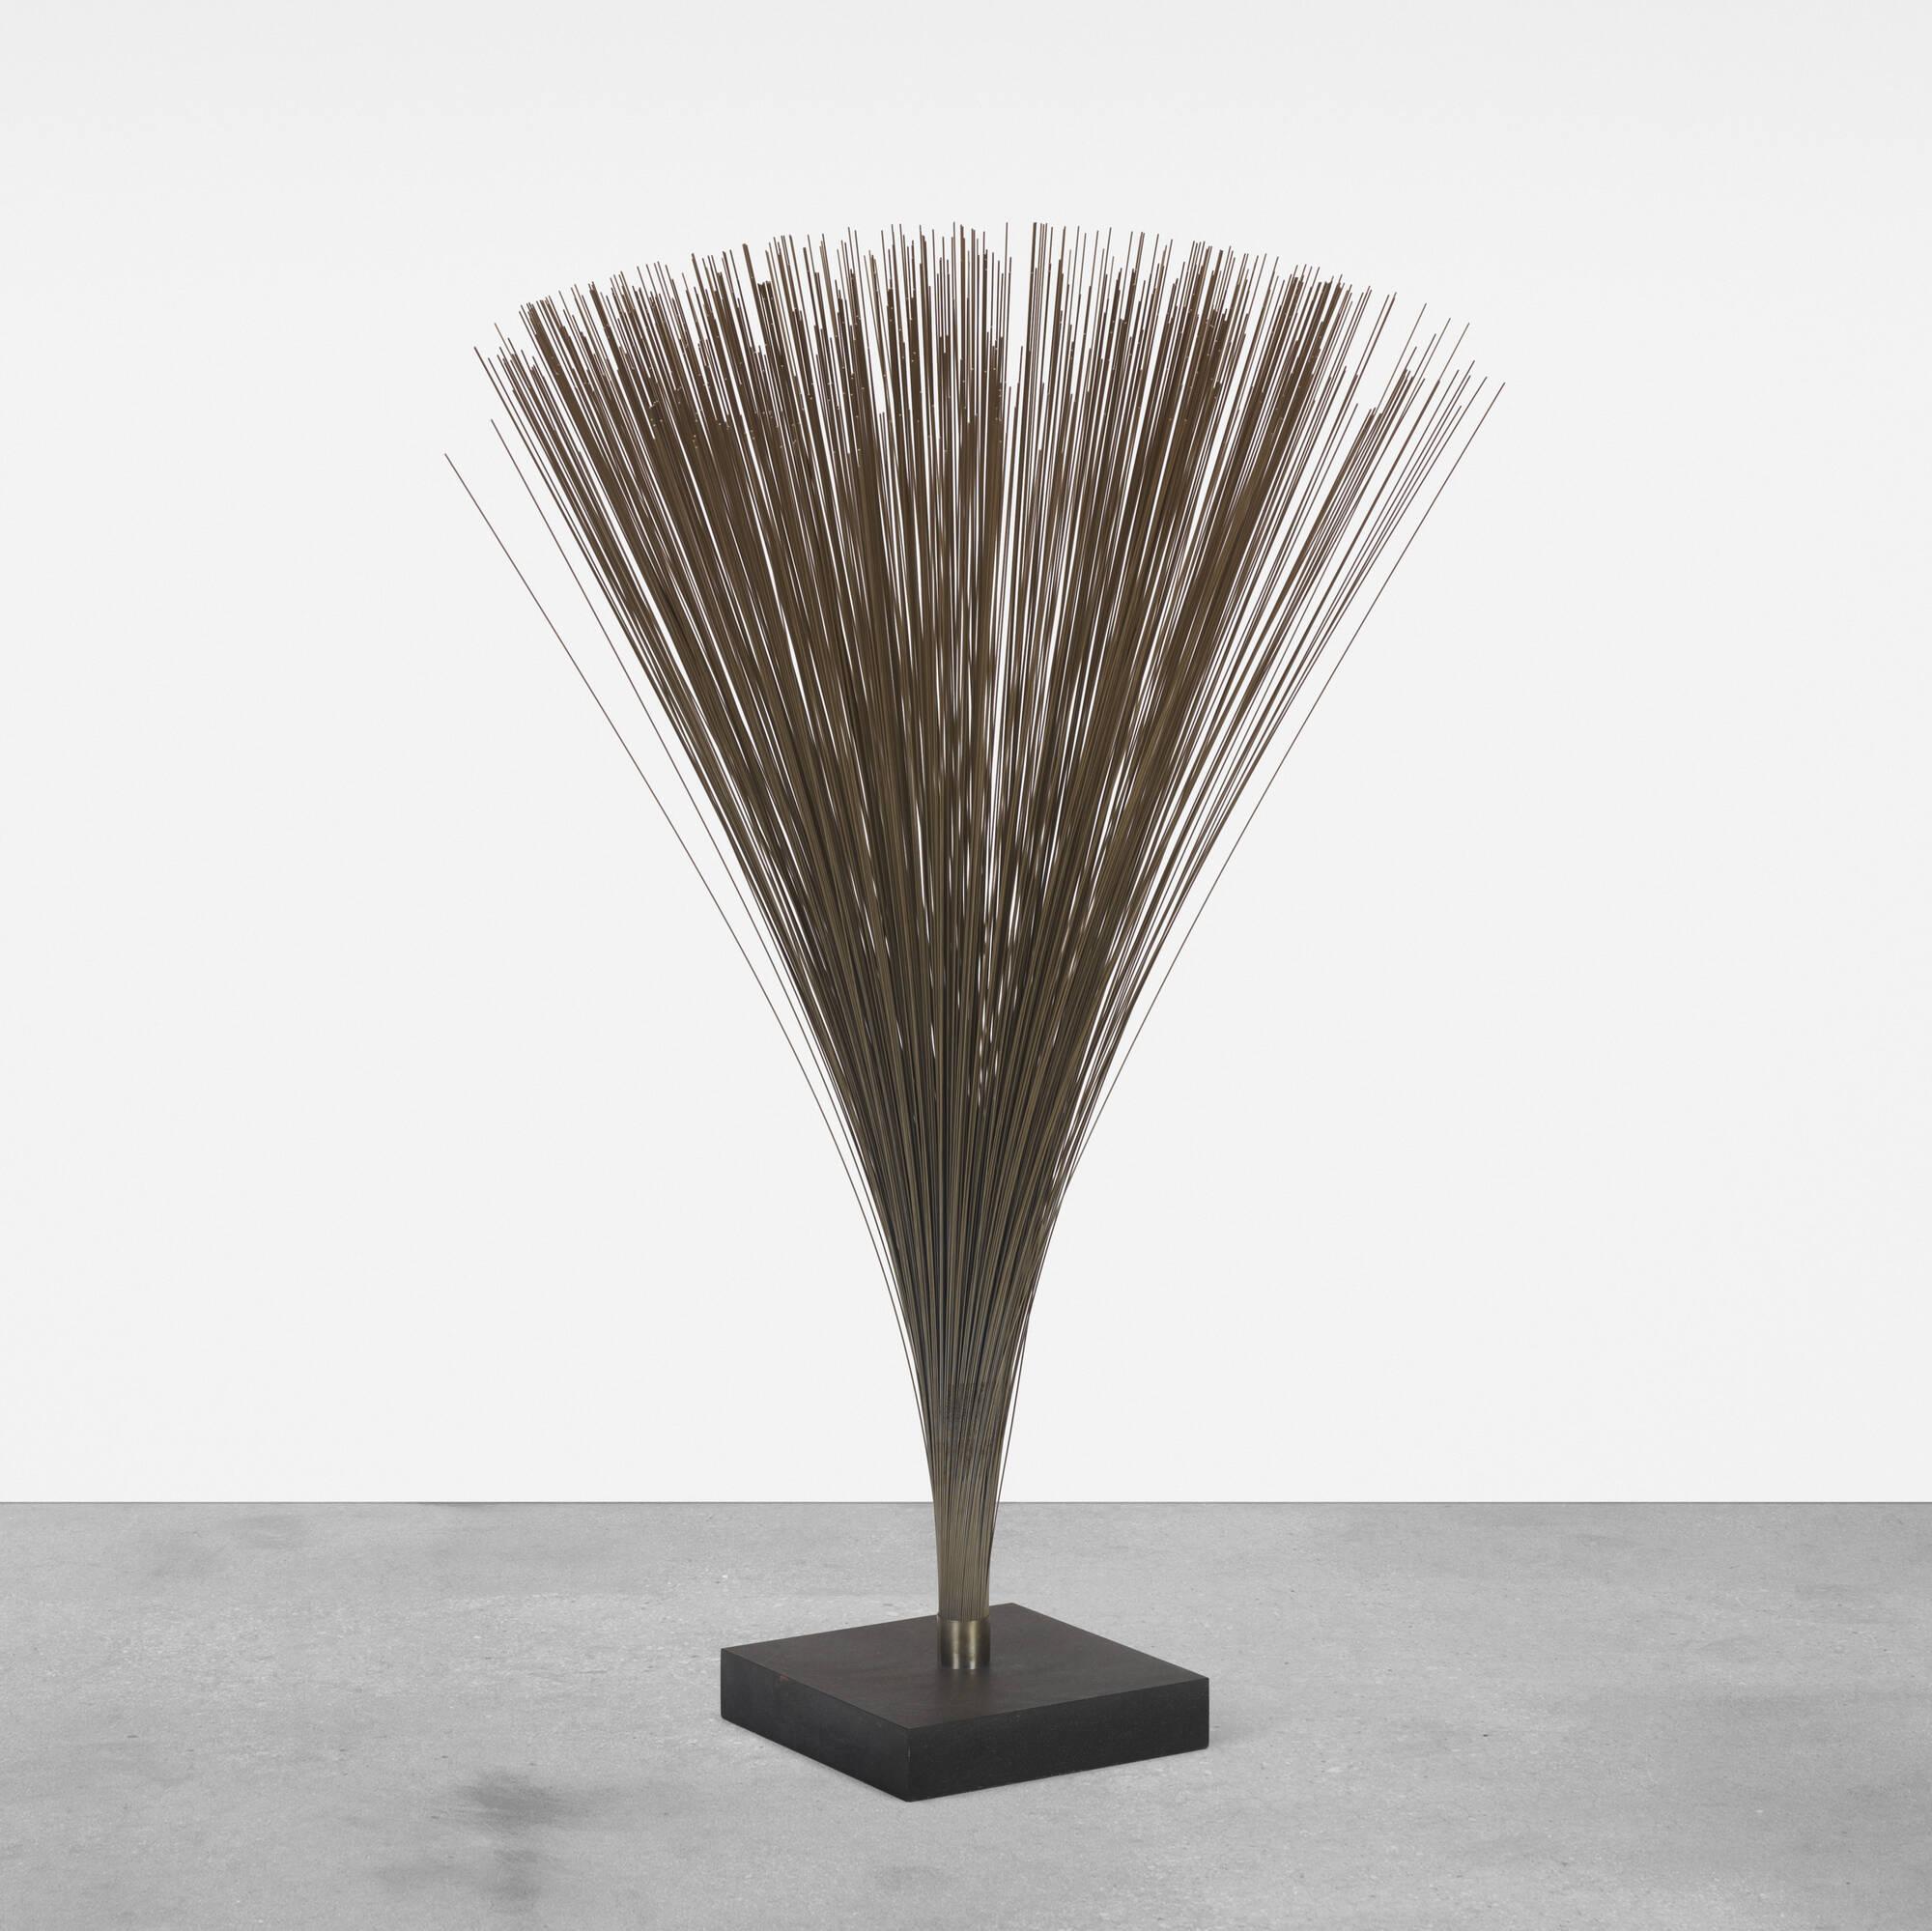 138: Harry Bertoia / Untitled (monumental Spray) (1 of 2)